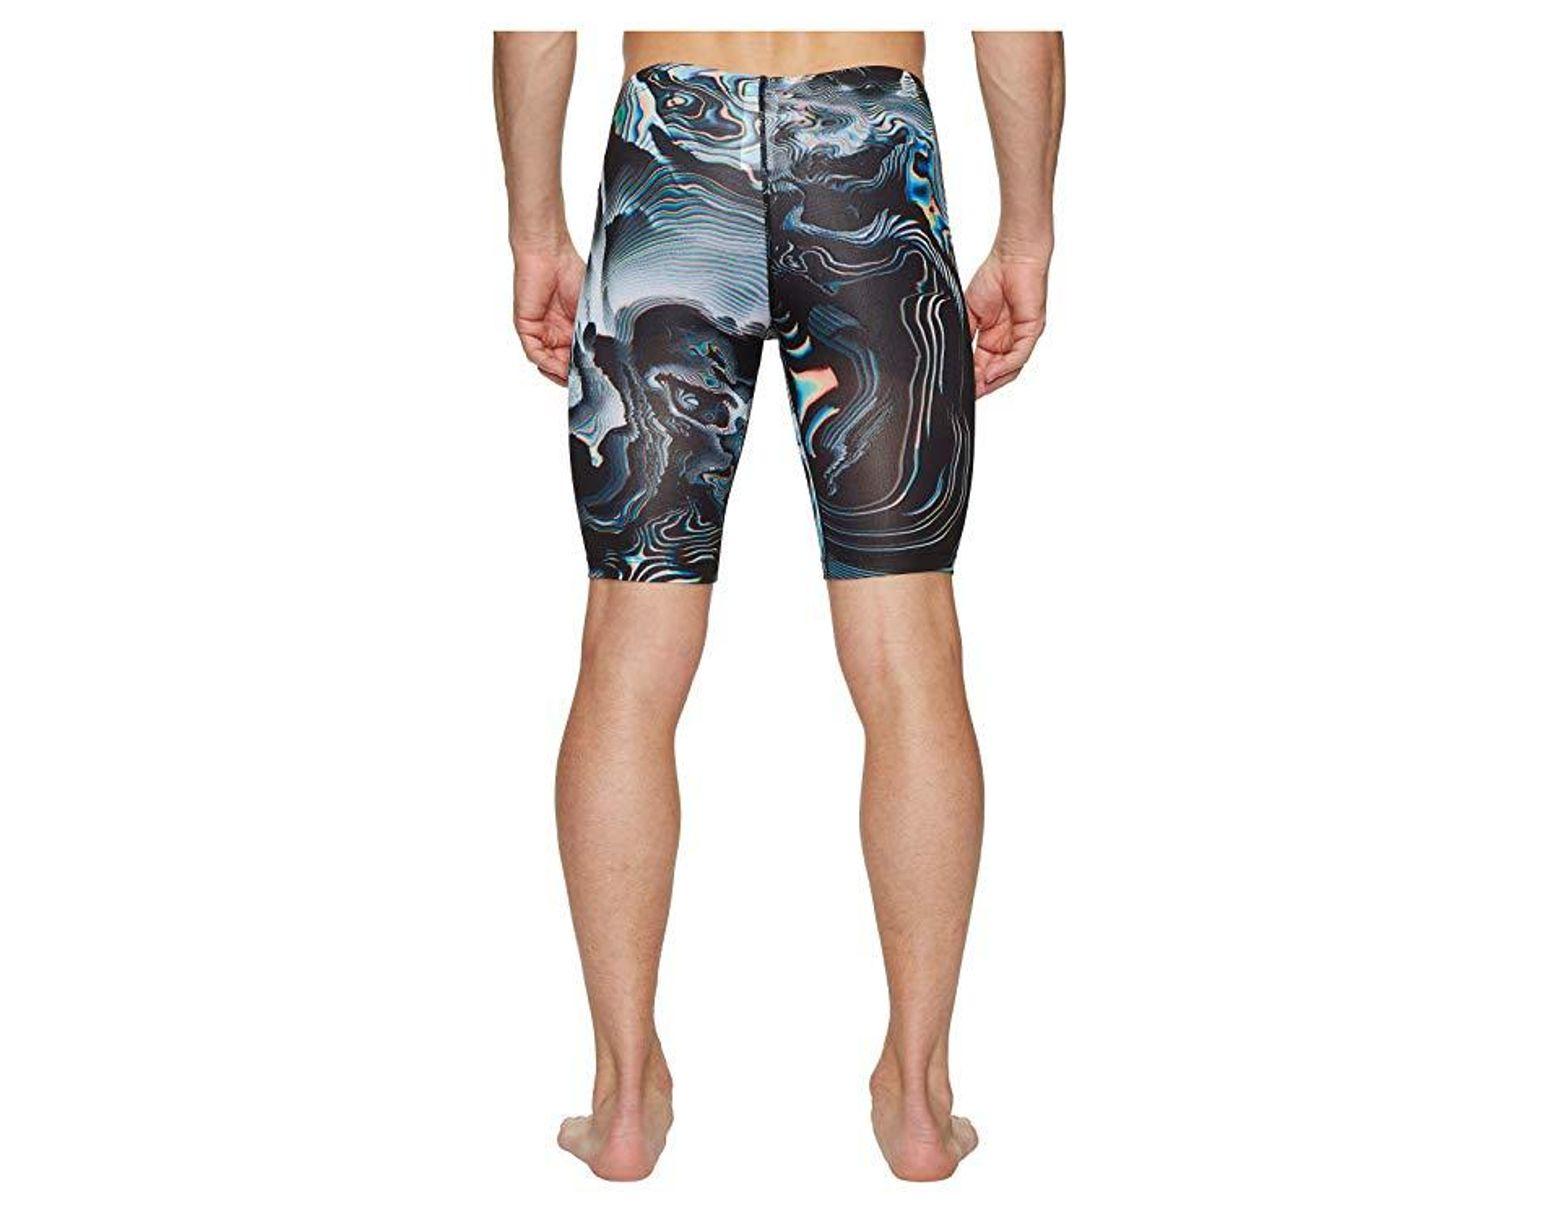 fc95a4edda Nike Geo Aftershock Jammer (black) Swimwear in Black for Men - Save 28% -  Lyst